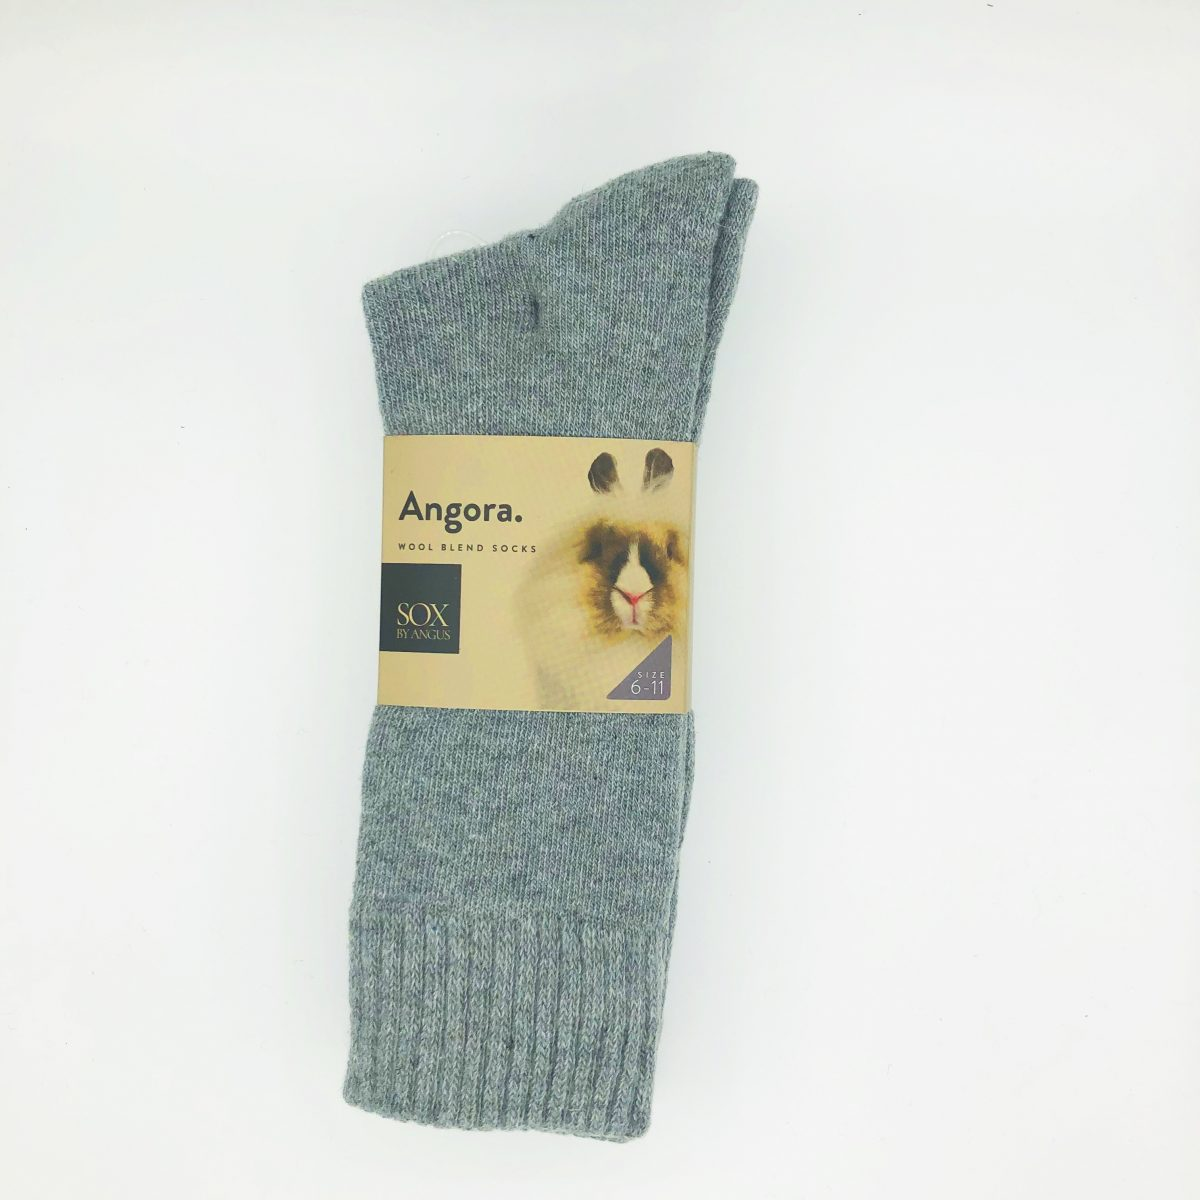 Angora Wool Blend Socks 2 Pair Pack - Light Grey